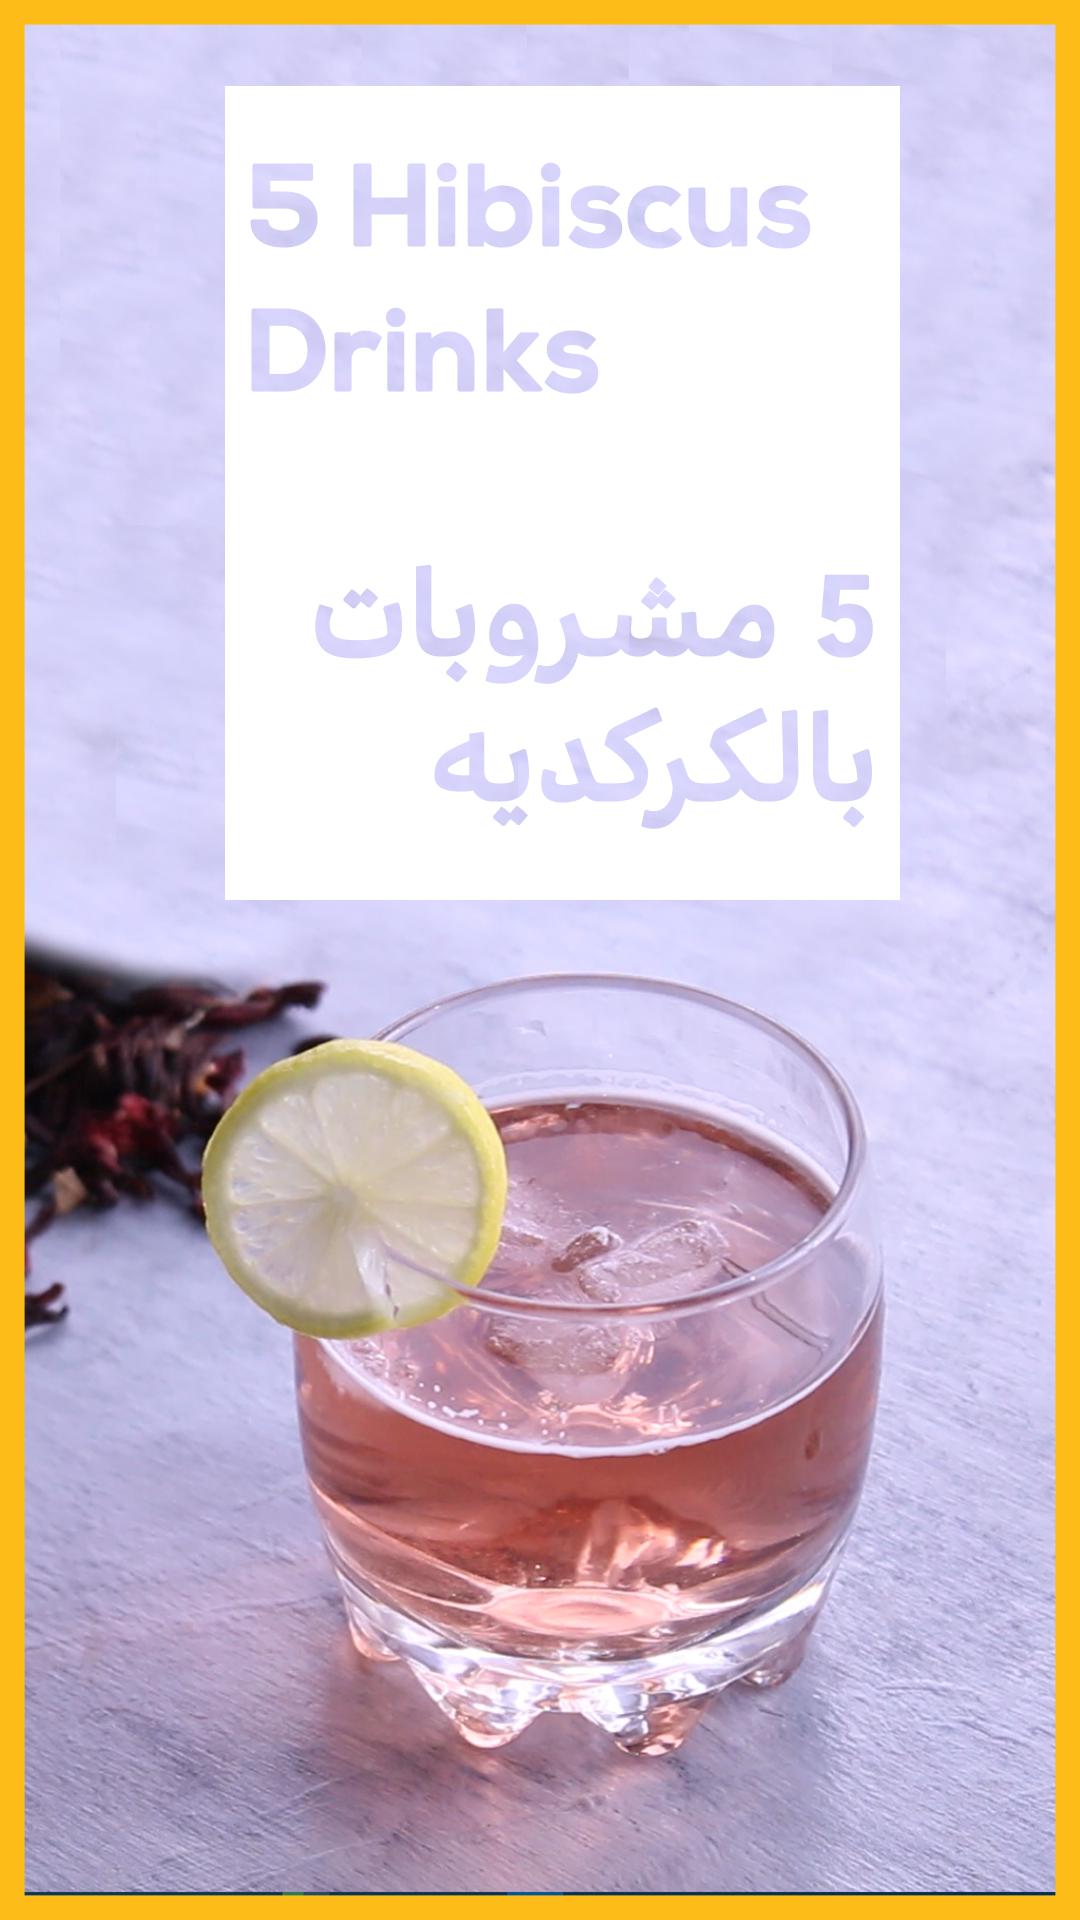 بالفيديو ٥ مشروبات لذيذة بالكركديه جربيها في رمضان Hibiscus Drink Glassware Tableware